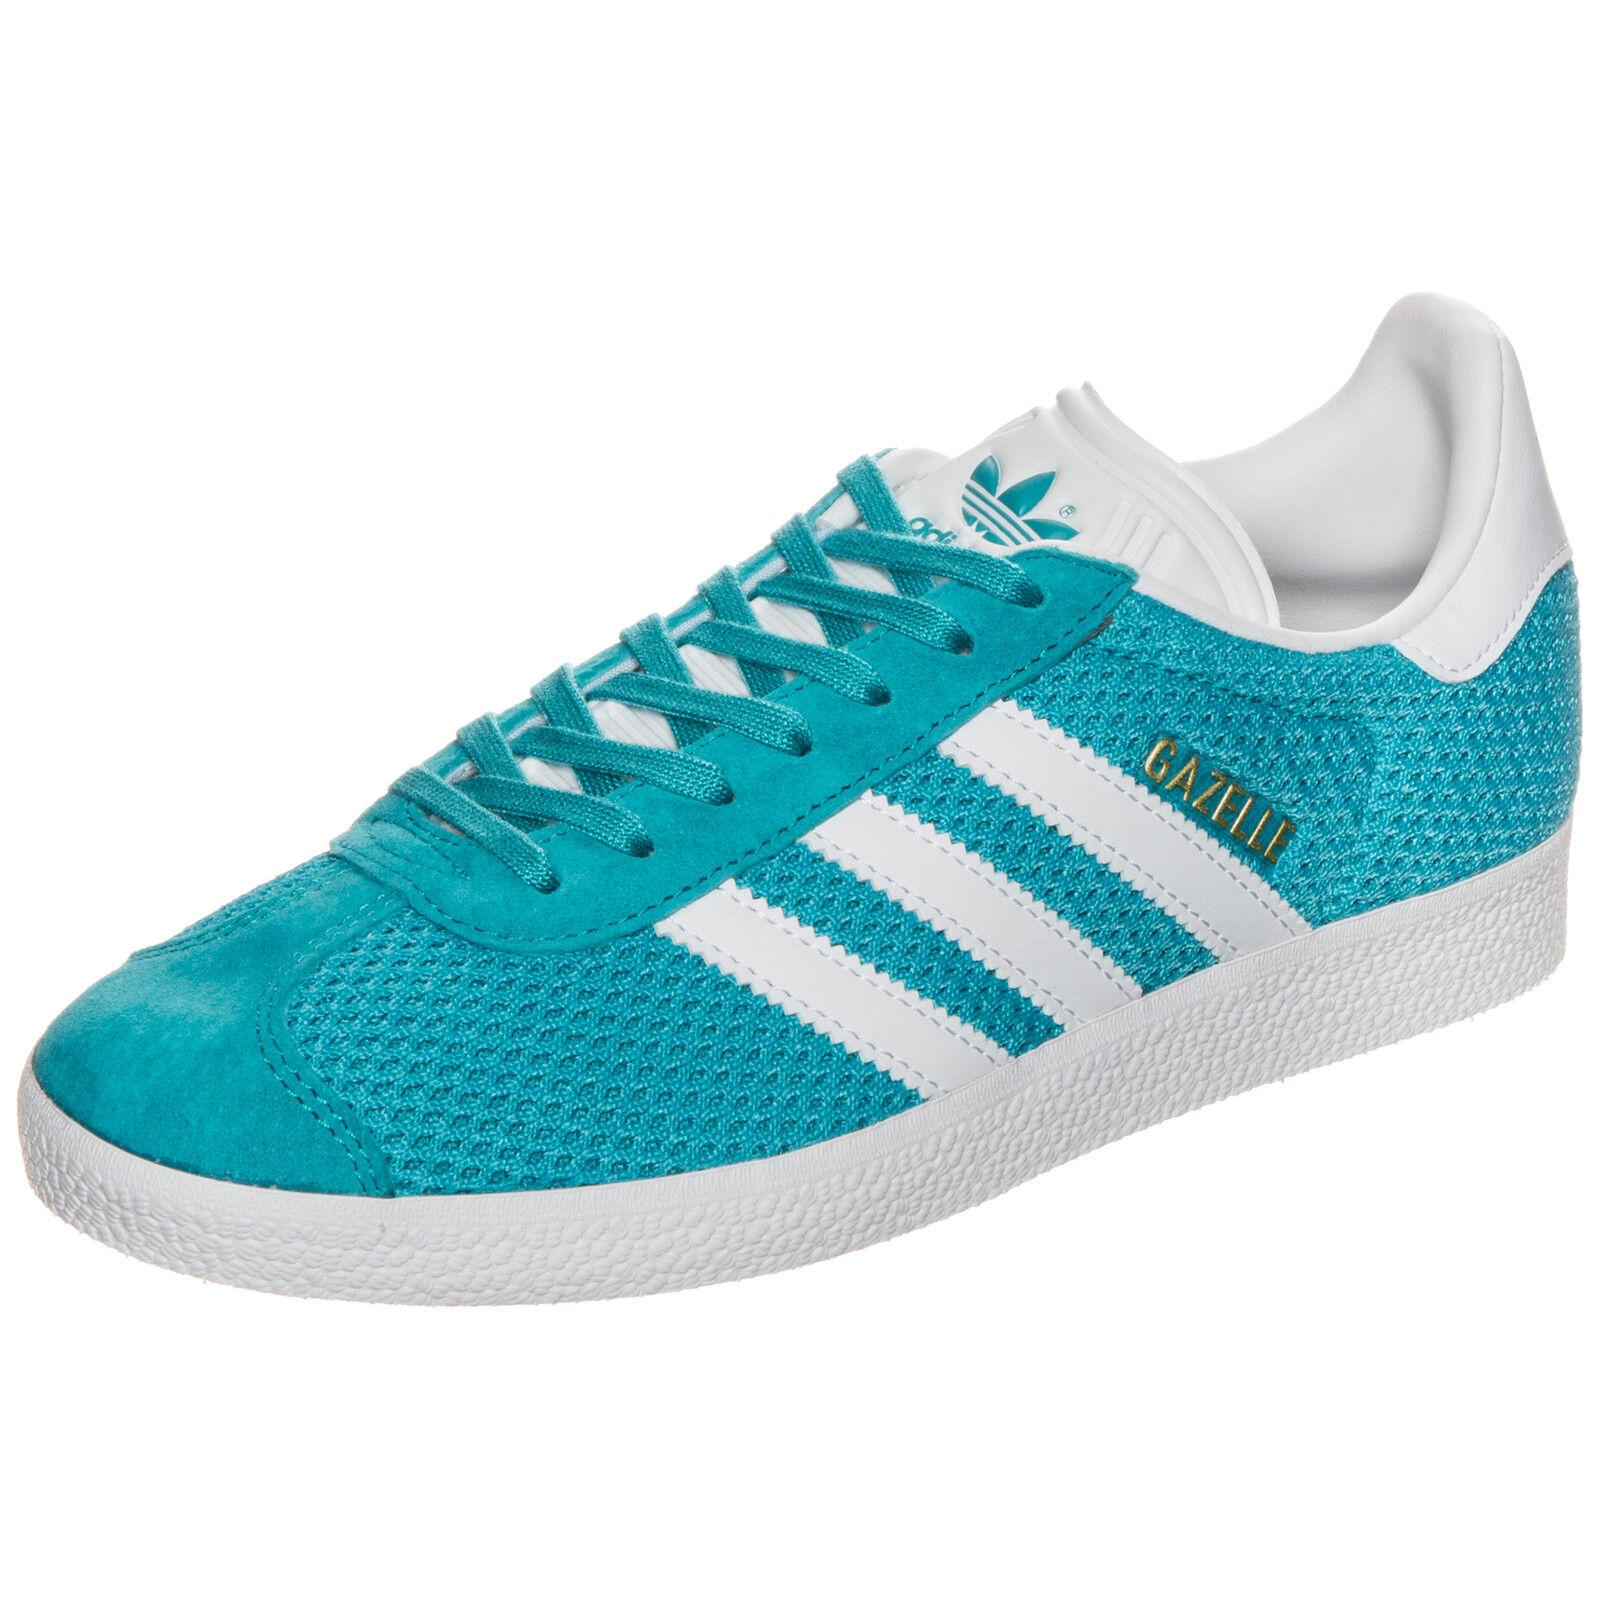 Adidas Originals Gazelle Turnschuhe Blau NEU Schuhe Turnschuhe